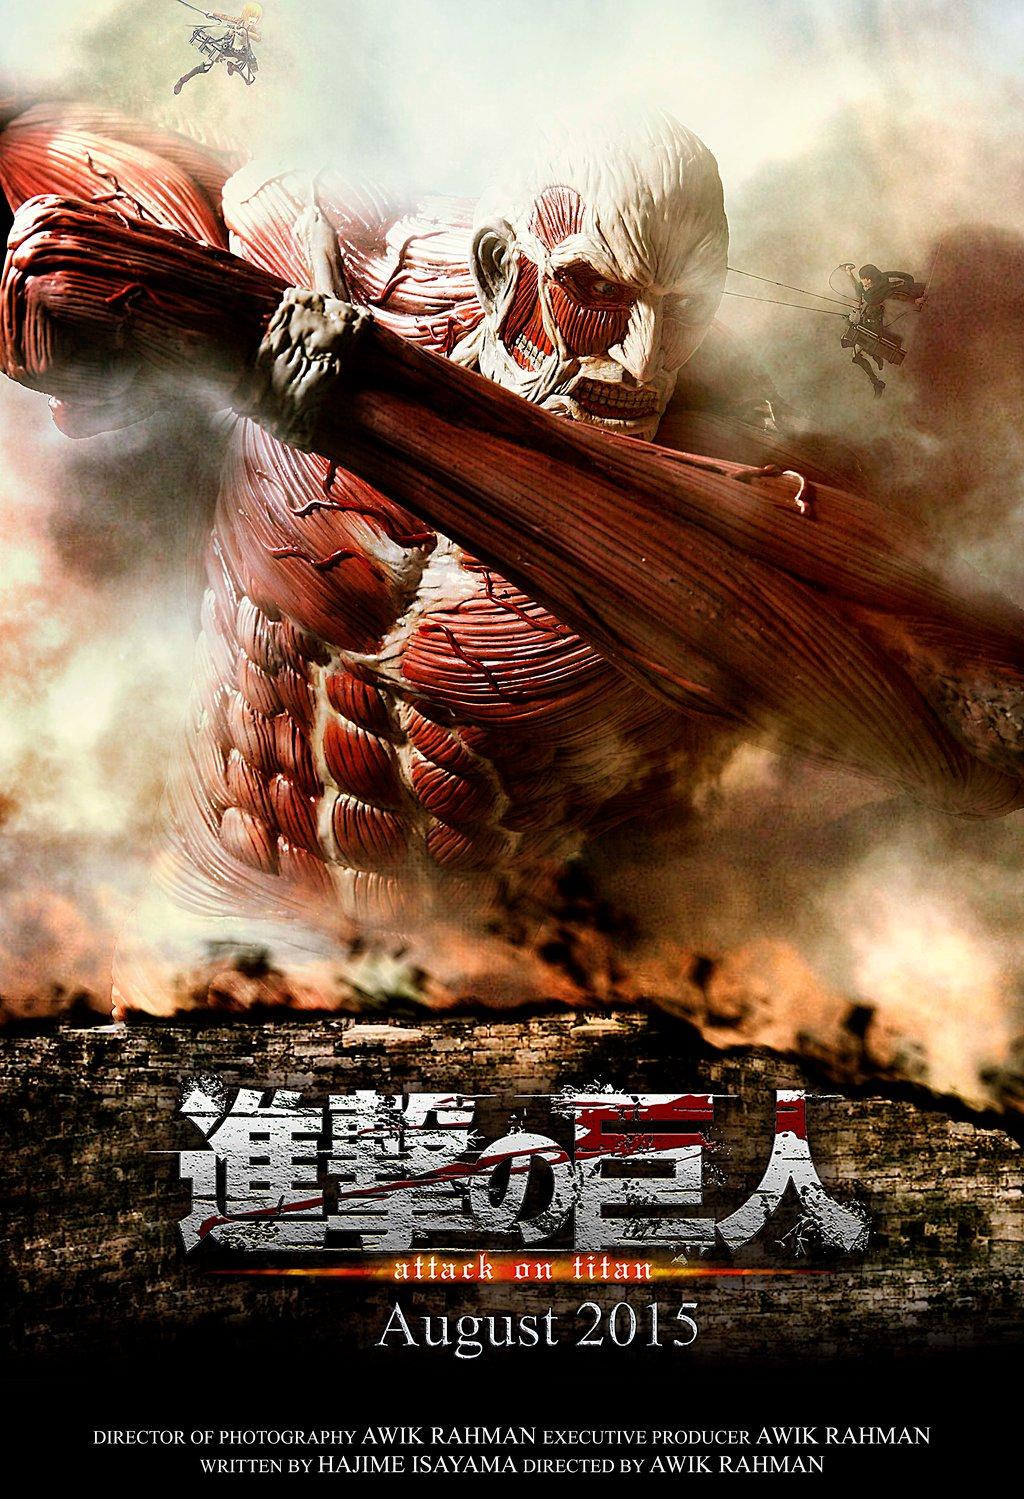 Attack On Titan Part 1 ผ่าพิภพไททัน เดอะมูฟวี่ [HD][พากย์ไทย]